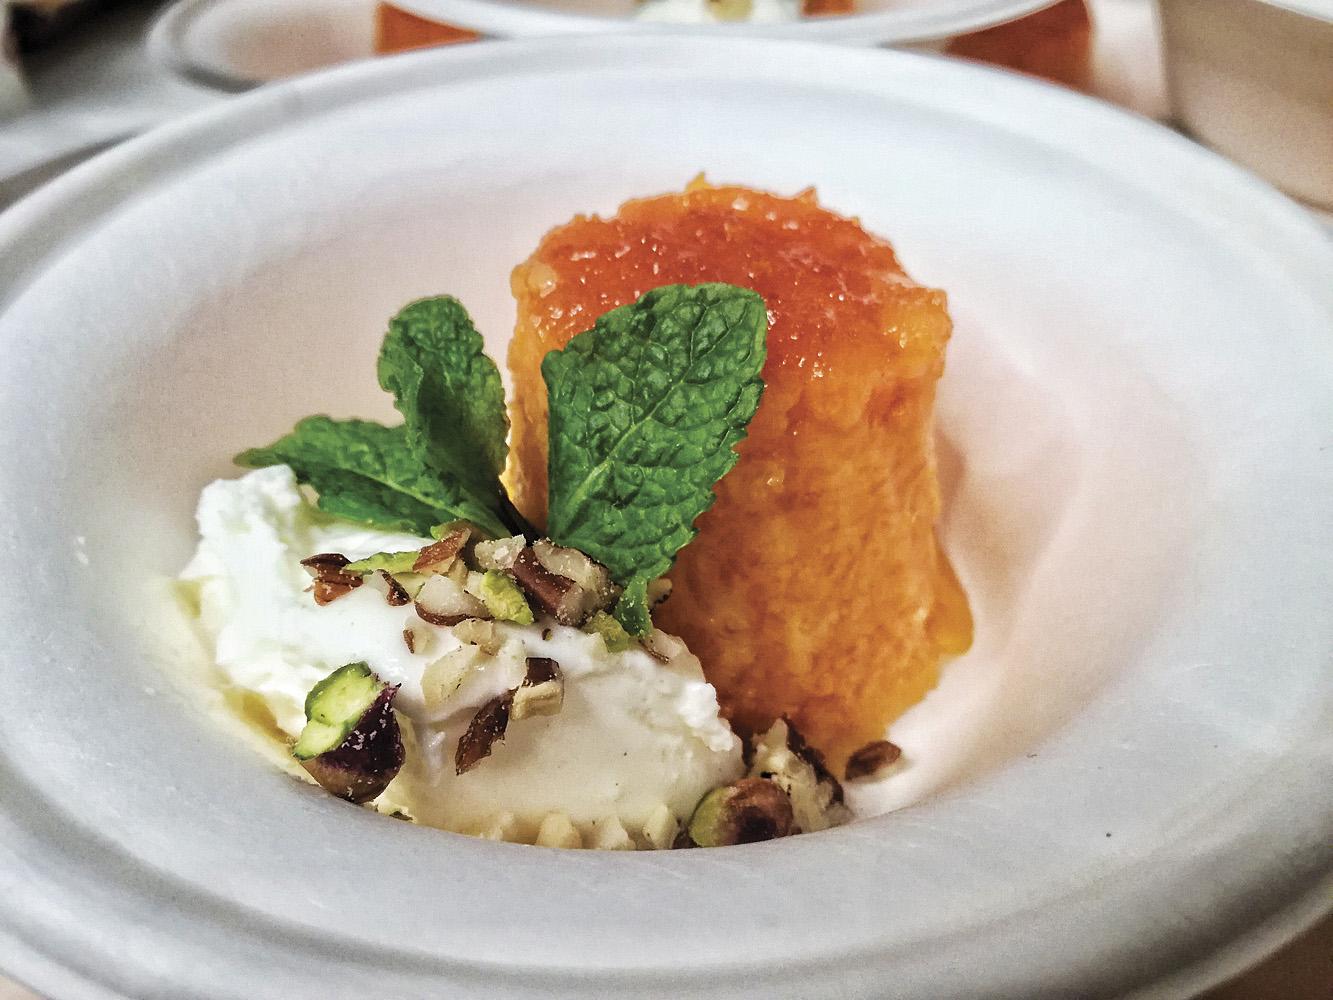 Prato gastronomico feito pelo Chef Jose Avillez